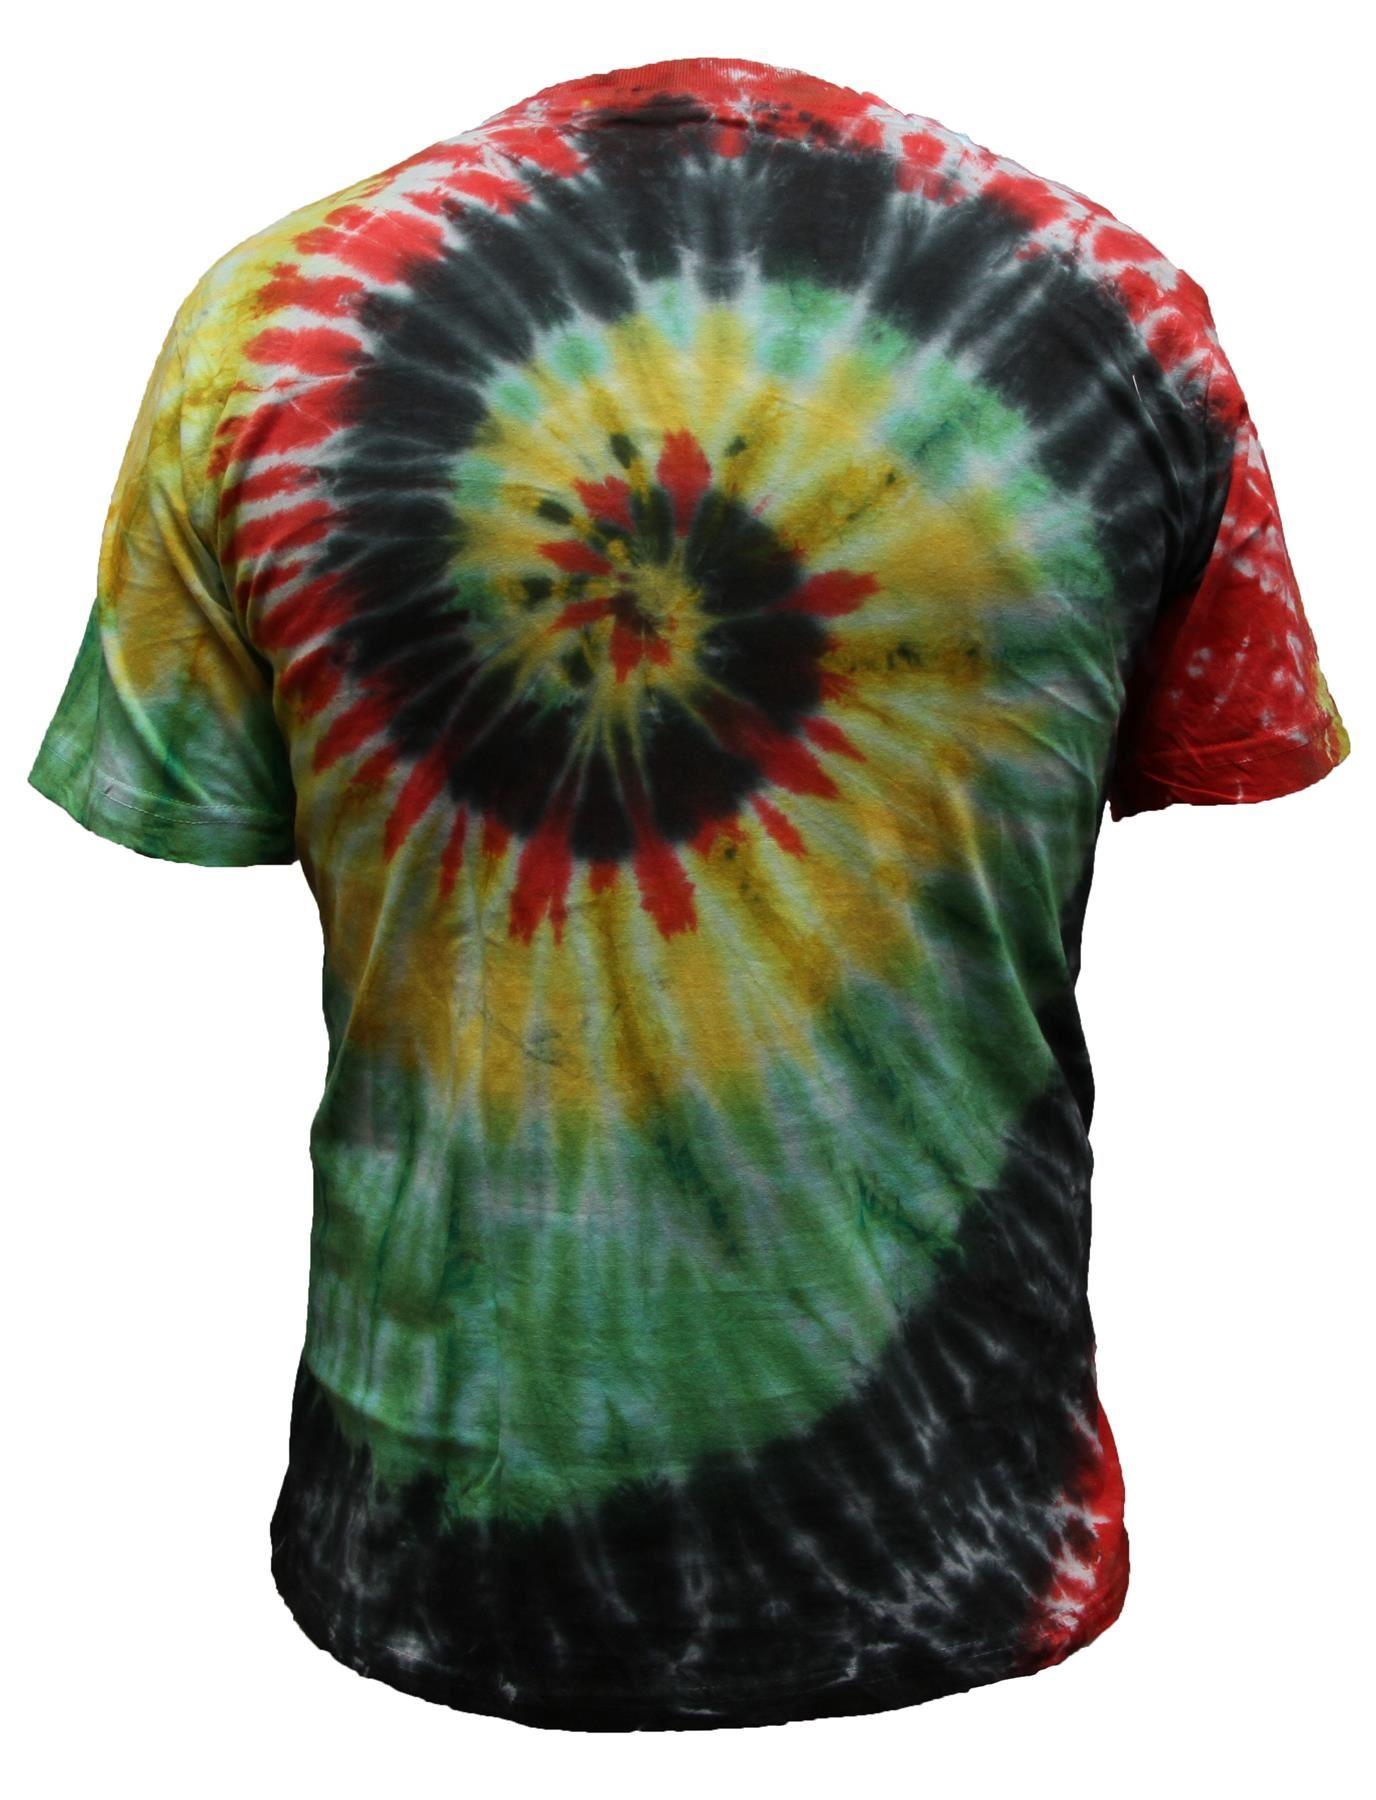 Tie-Dye-T-Shirt-Music-Festival-Tye-Dye-Tee-Hipster-Retro-Unisex-Short-Sleeve-Top thumbnail 11